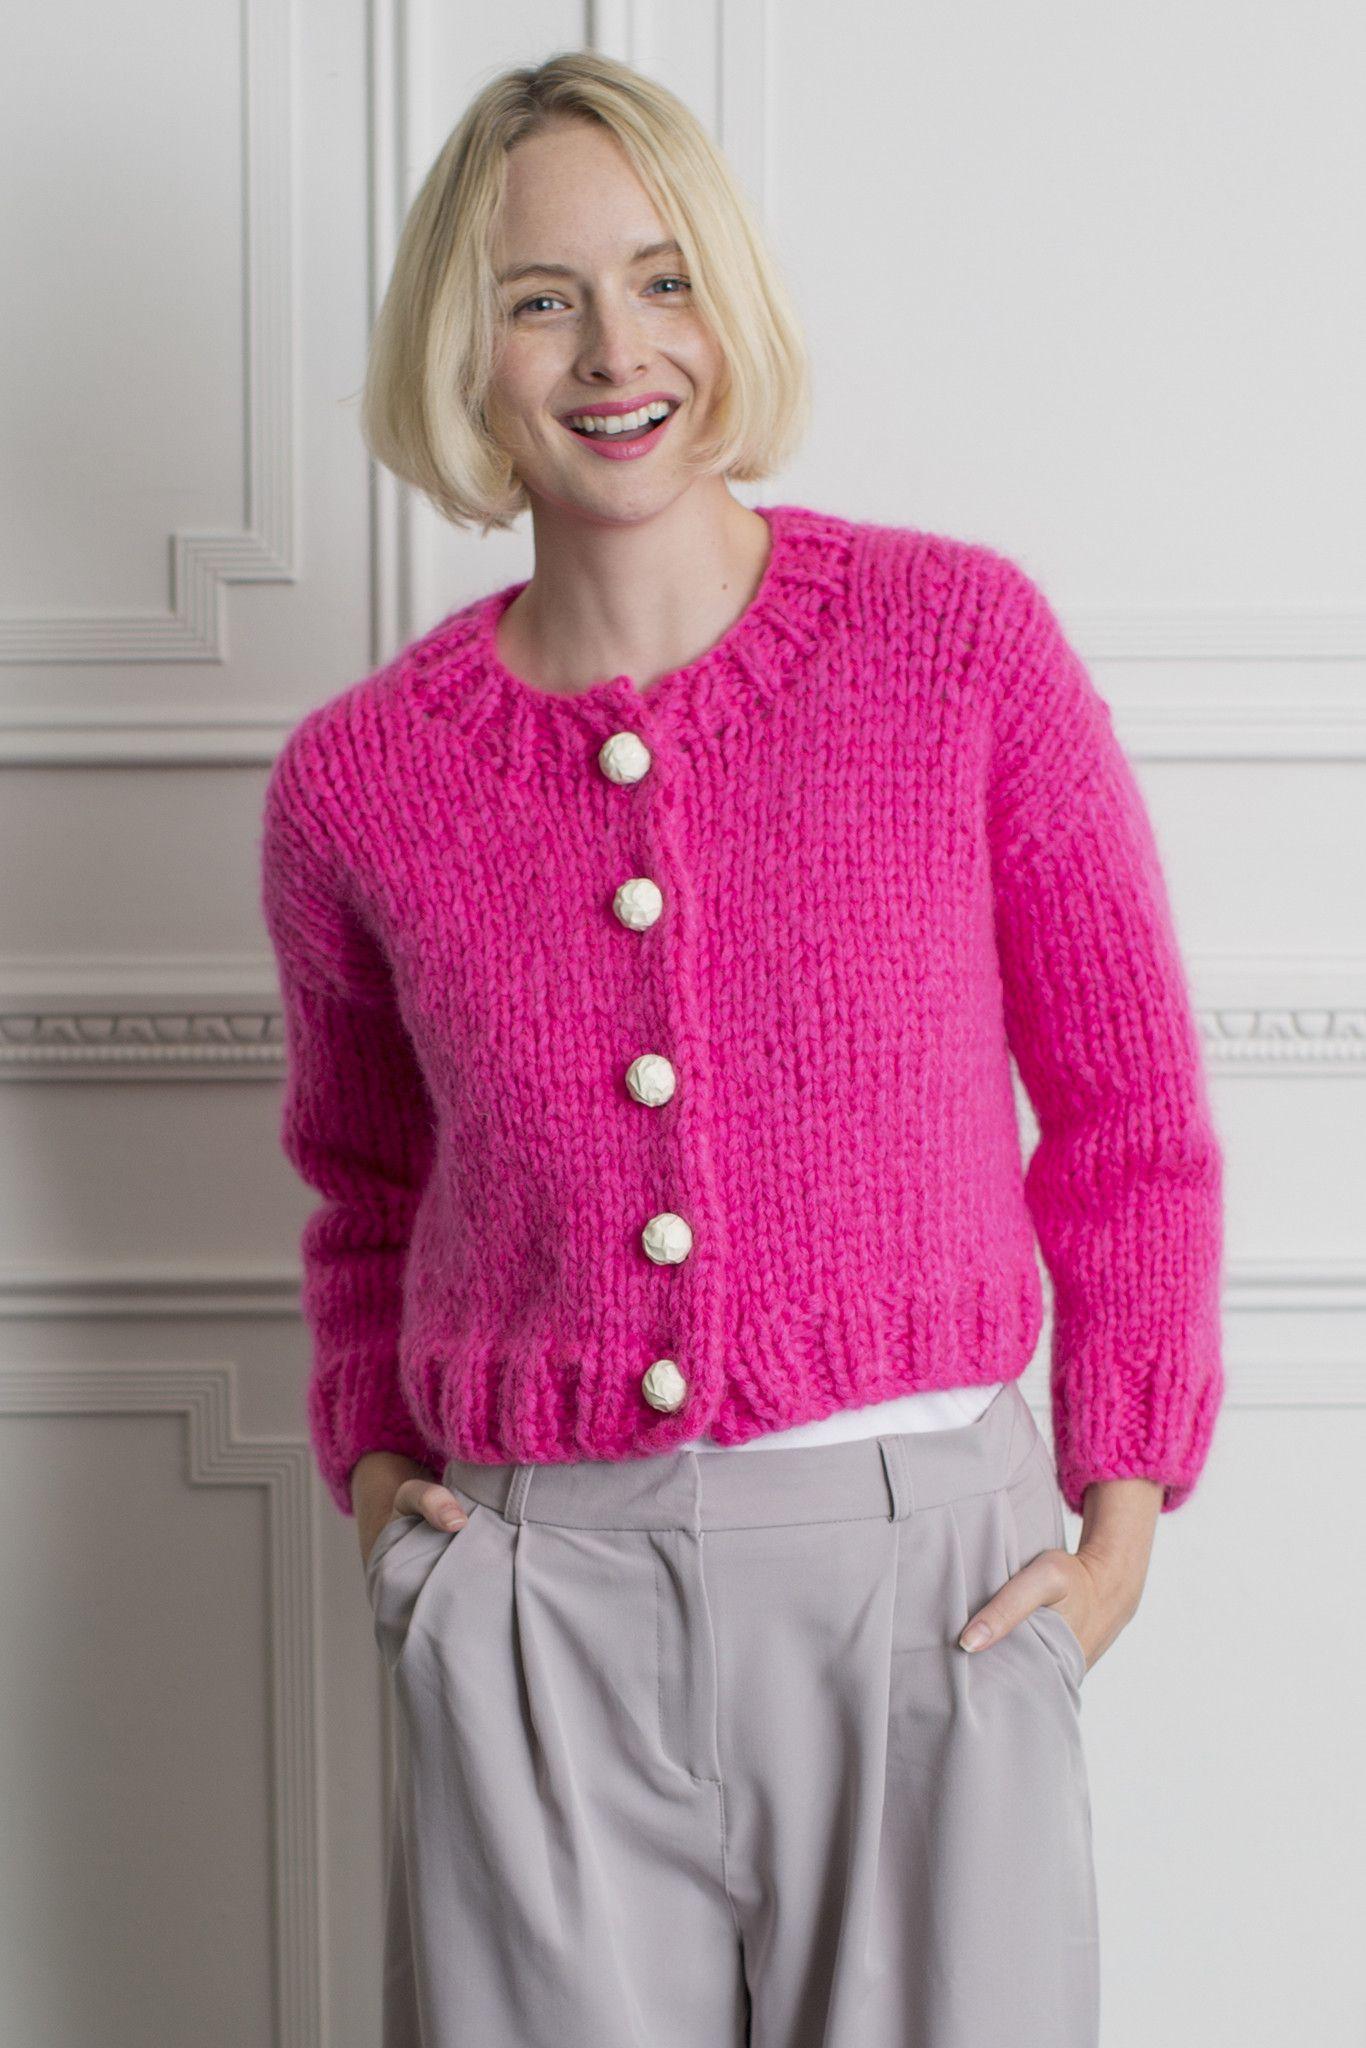 Womens Cropped Cardigan Knitting Pattern   The Knitting ...